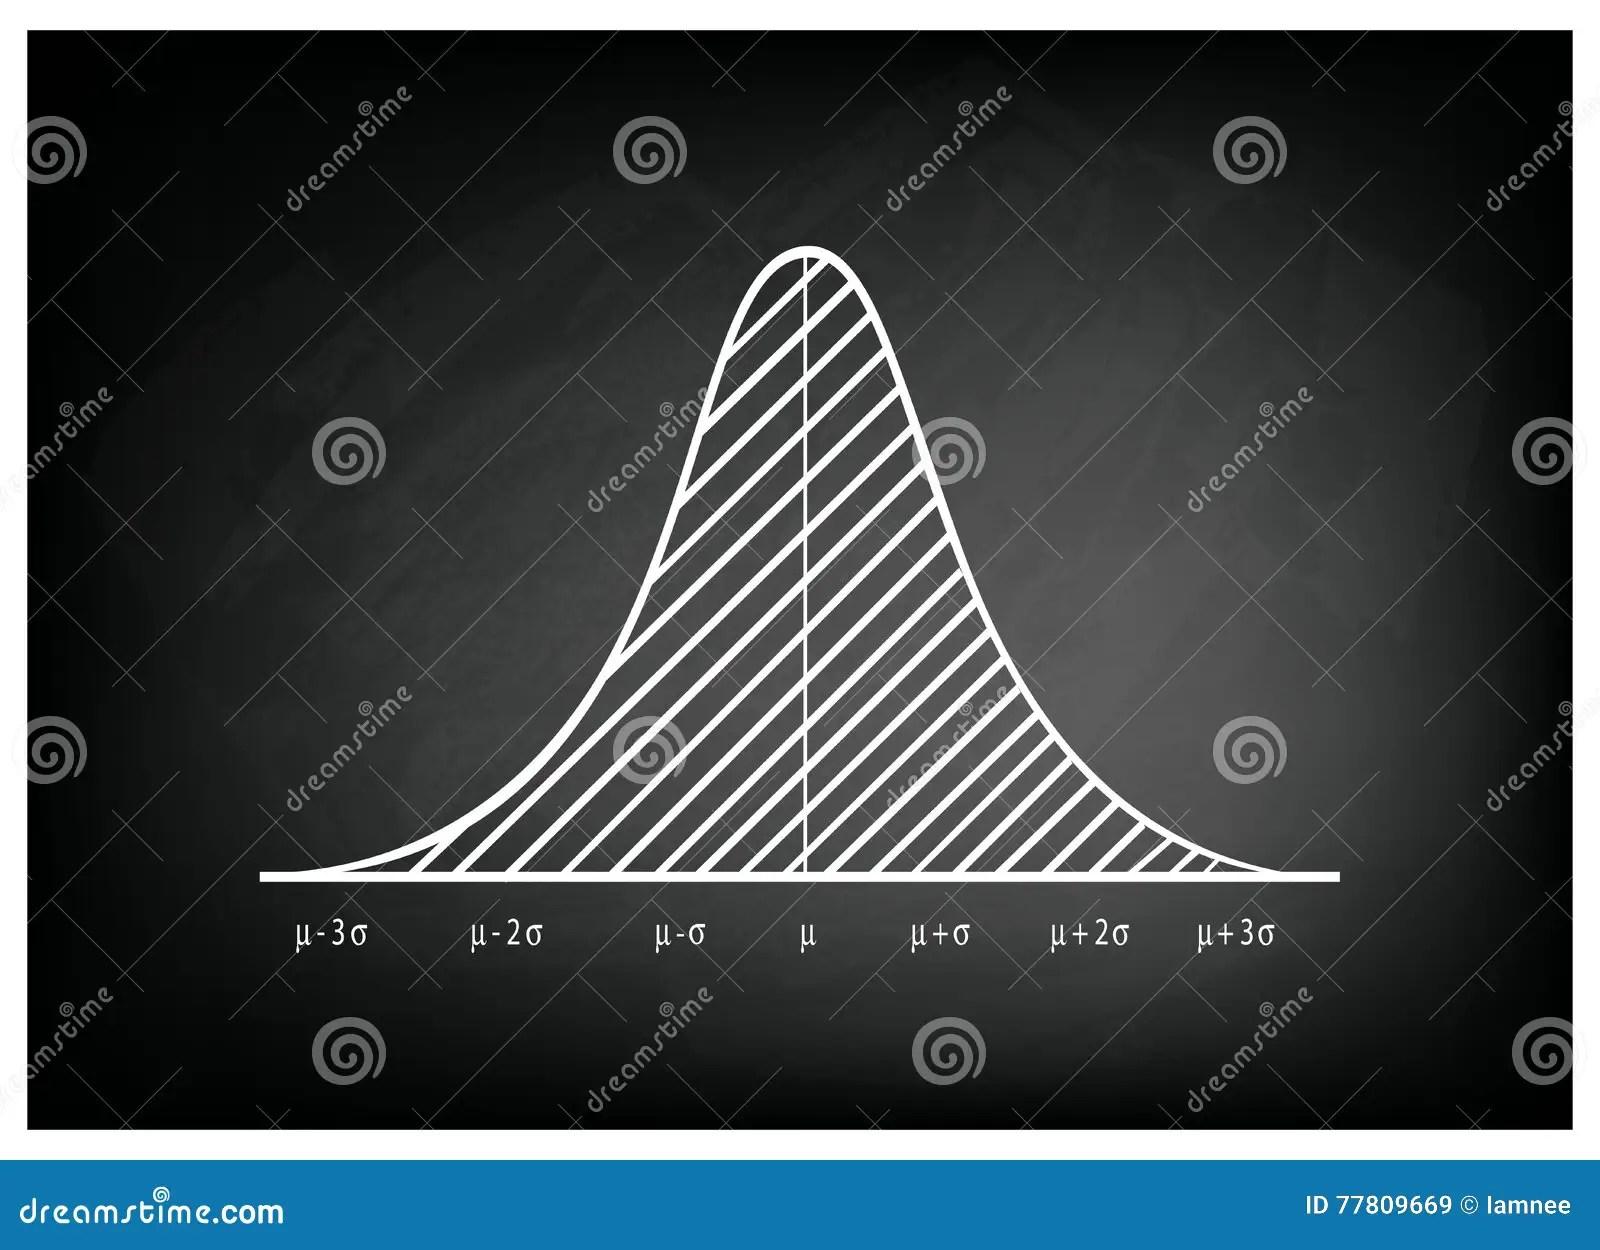 Normal Distribution Diagram Or Bell Curve On Blackboard